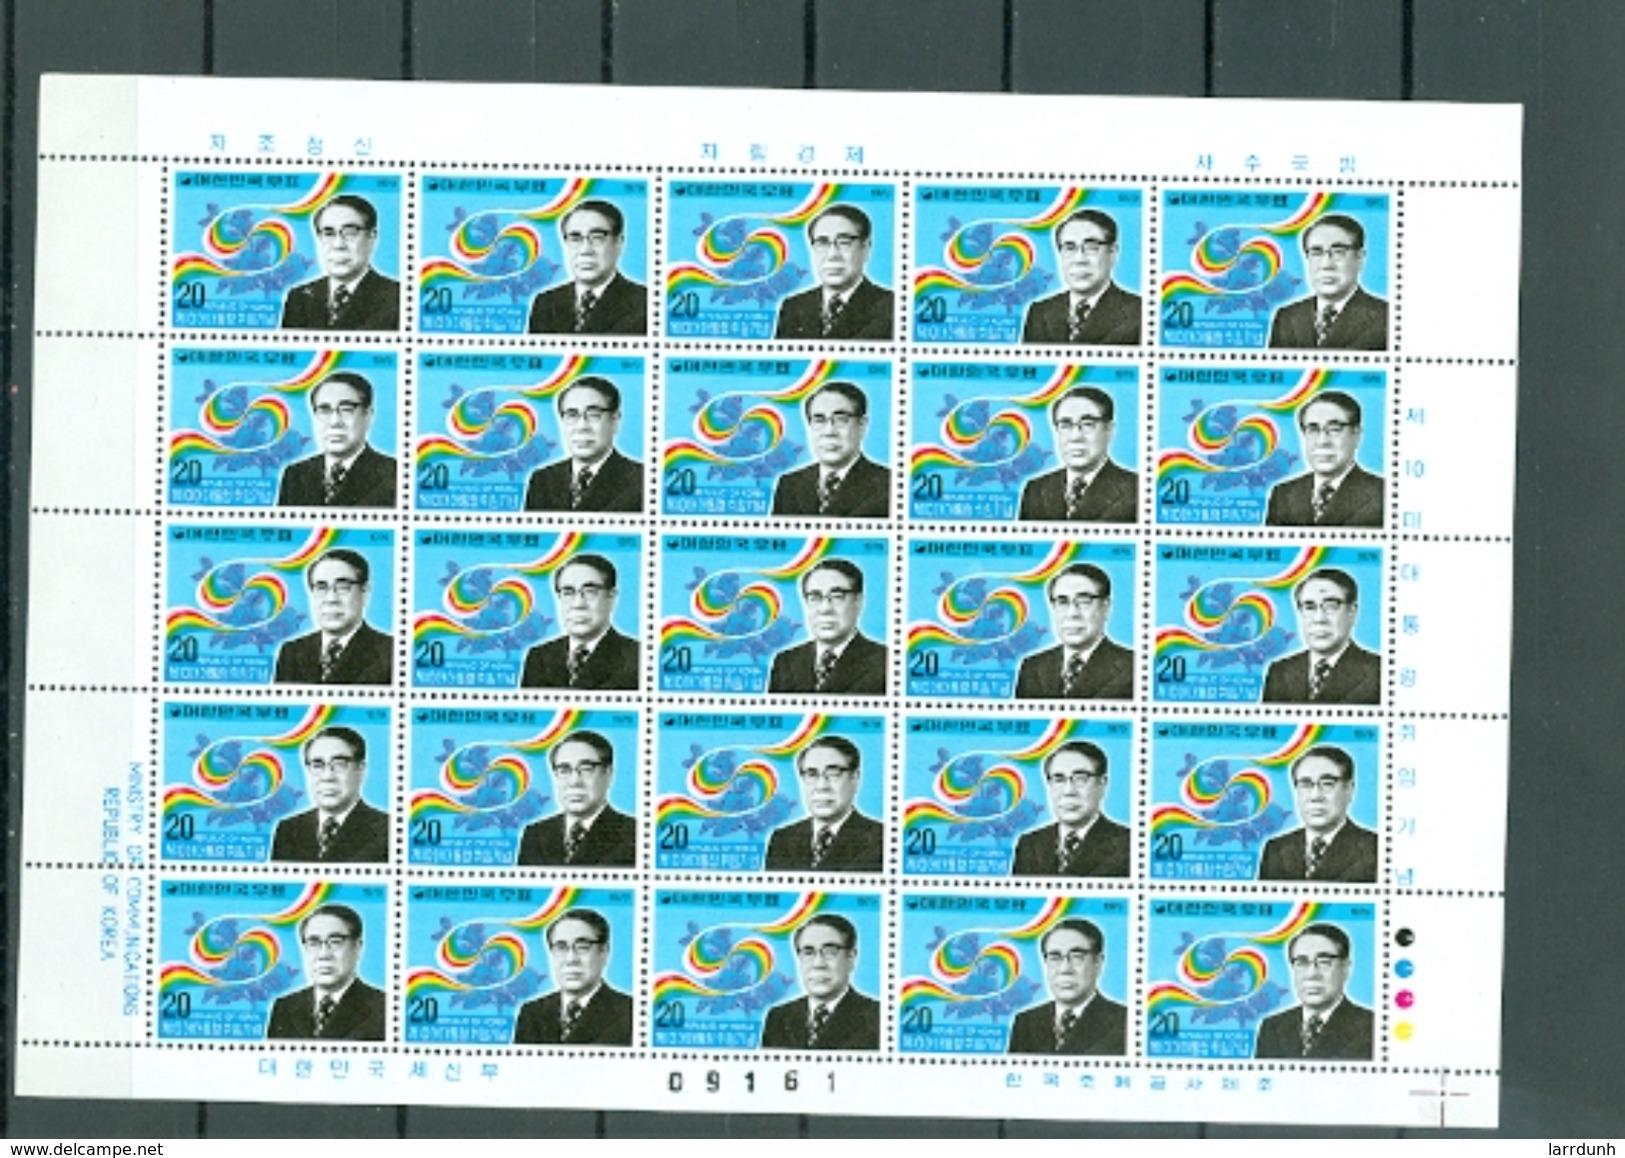 Korea 1186 Inauguration Of President Choi Kyu-hah Unfolded Sheet Of 20 MNH WYSIWYG 1979 A04s - Korea (Zuid)